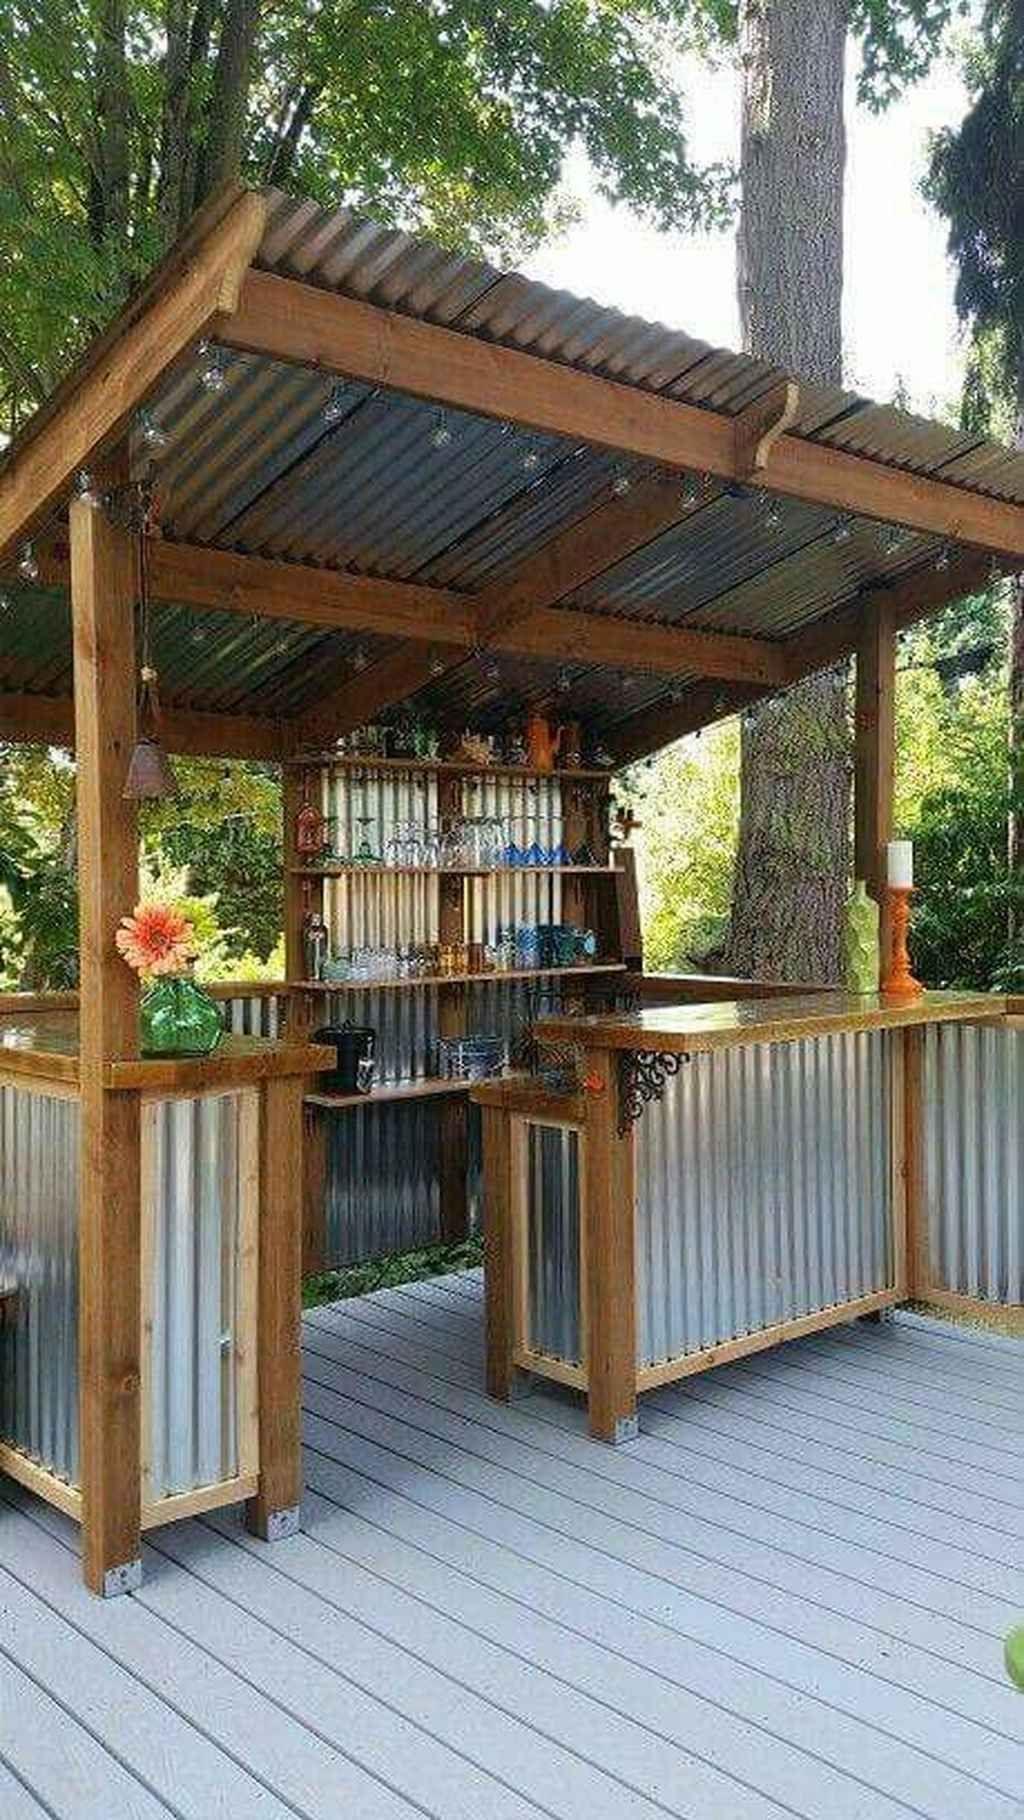 95 Amazing Outdoor Kitchen Design For Your Summer Ideas In 2020 Backyard Patio Designs Backyard Patio Outdoor Patio Ideas Backyards